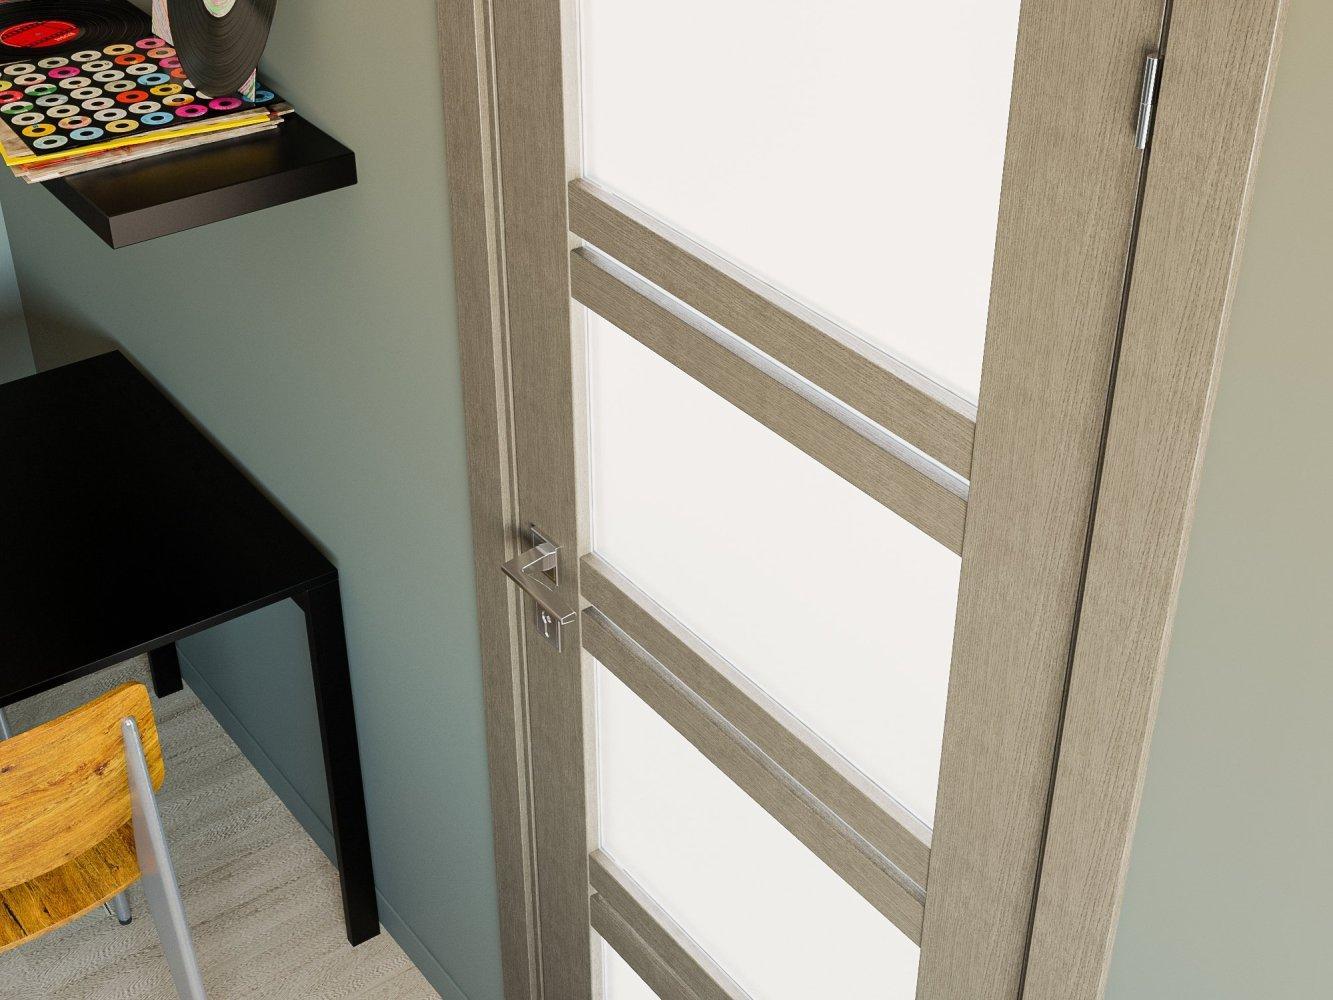 Двери Modern Quadro Родос крем со стеклом - Межкомнатные двери — фото №1